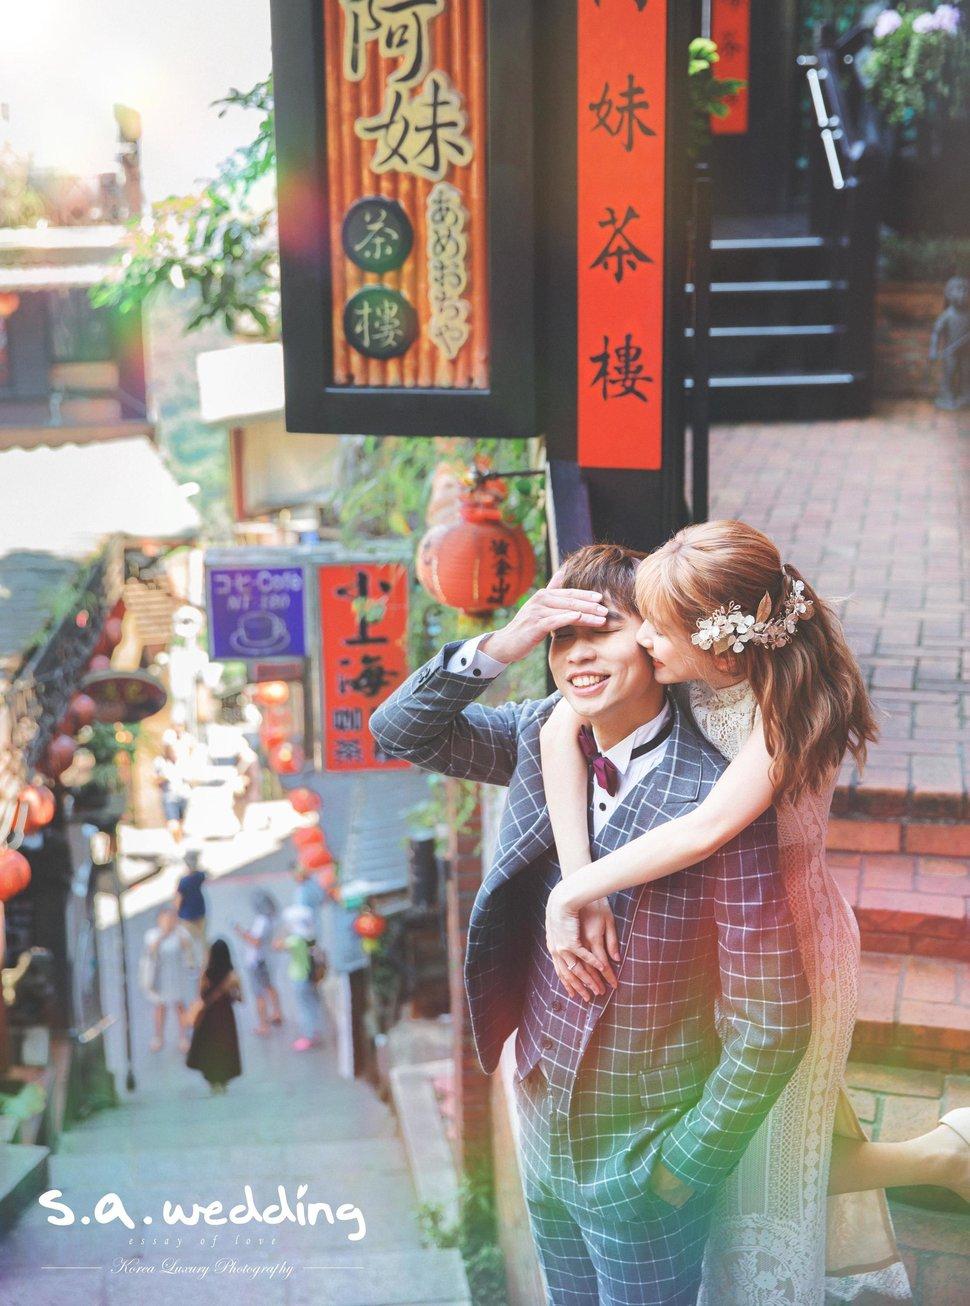 NSH_0413_ps (Copy) - s.a. wedding 韓國婚紗攝影《結婚吧》